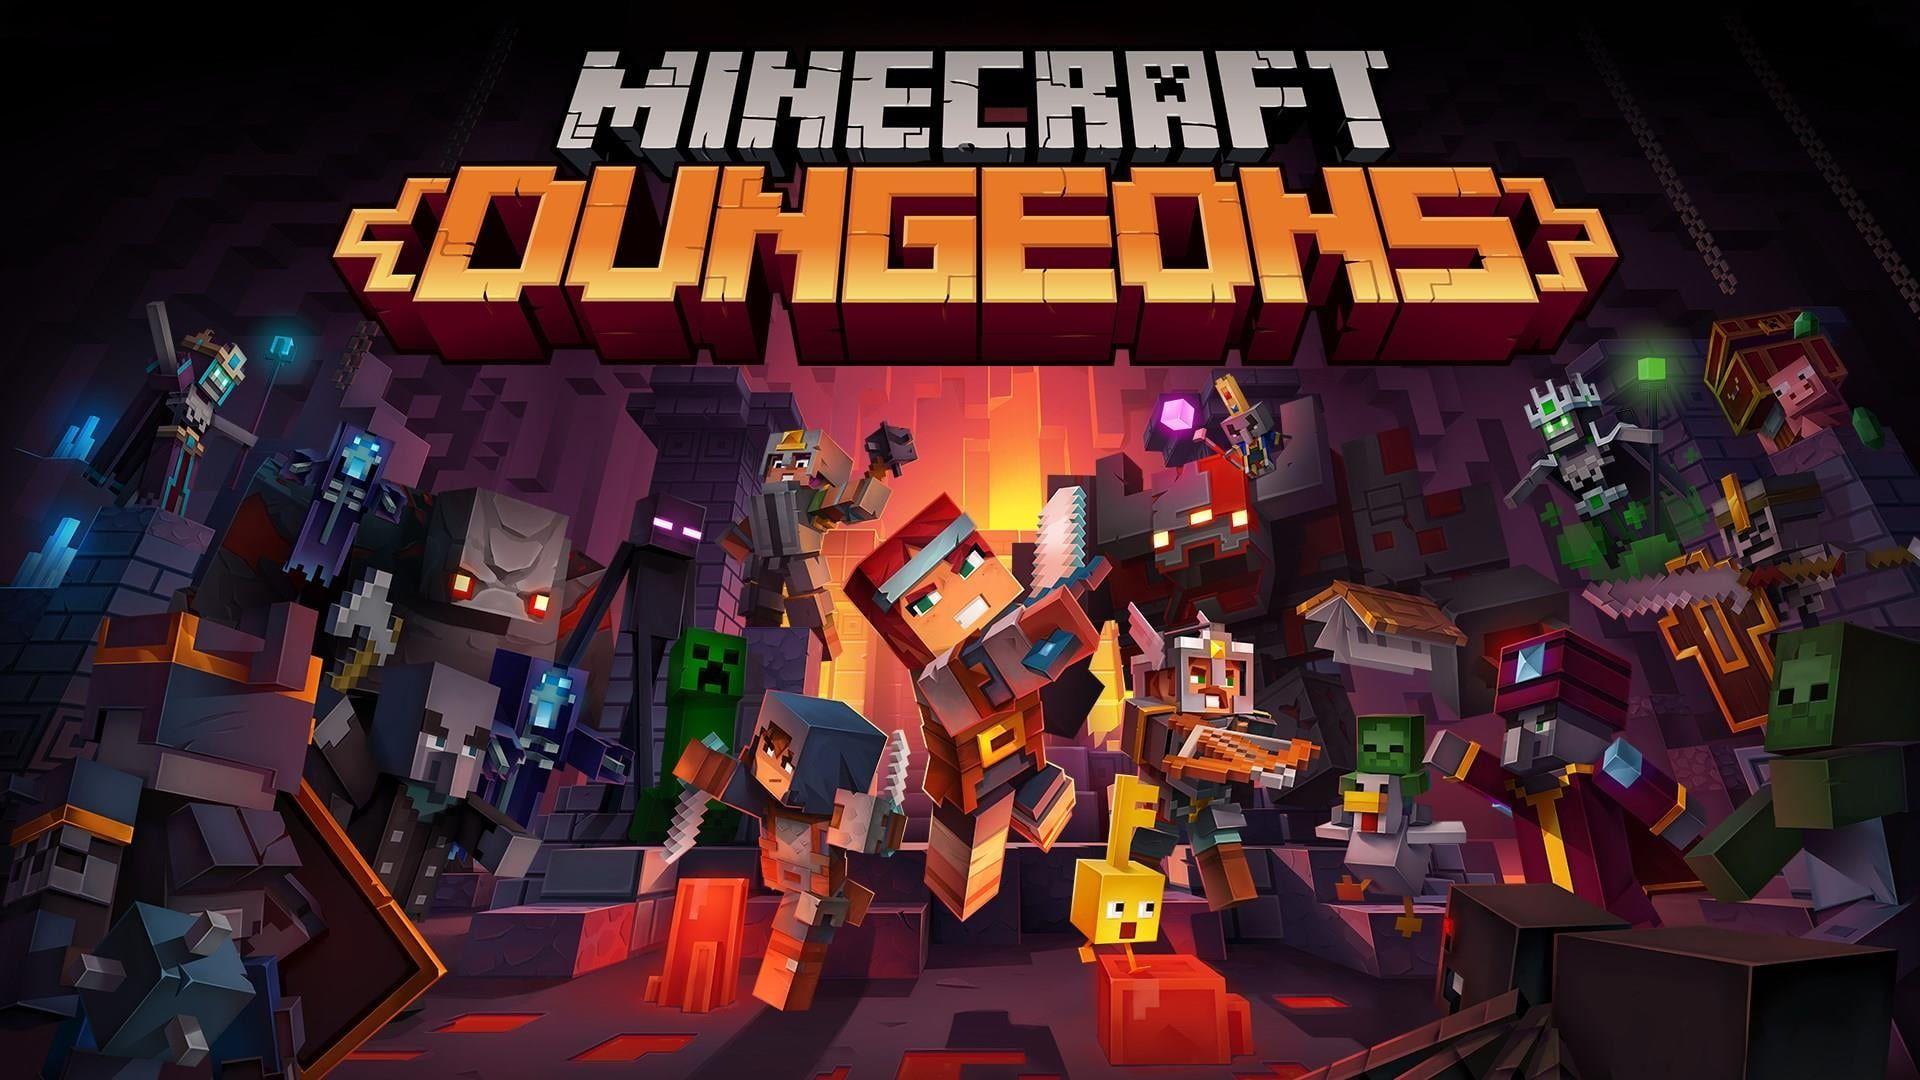 minecraft dungeons video game wallpaper 71279